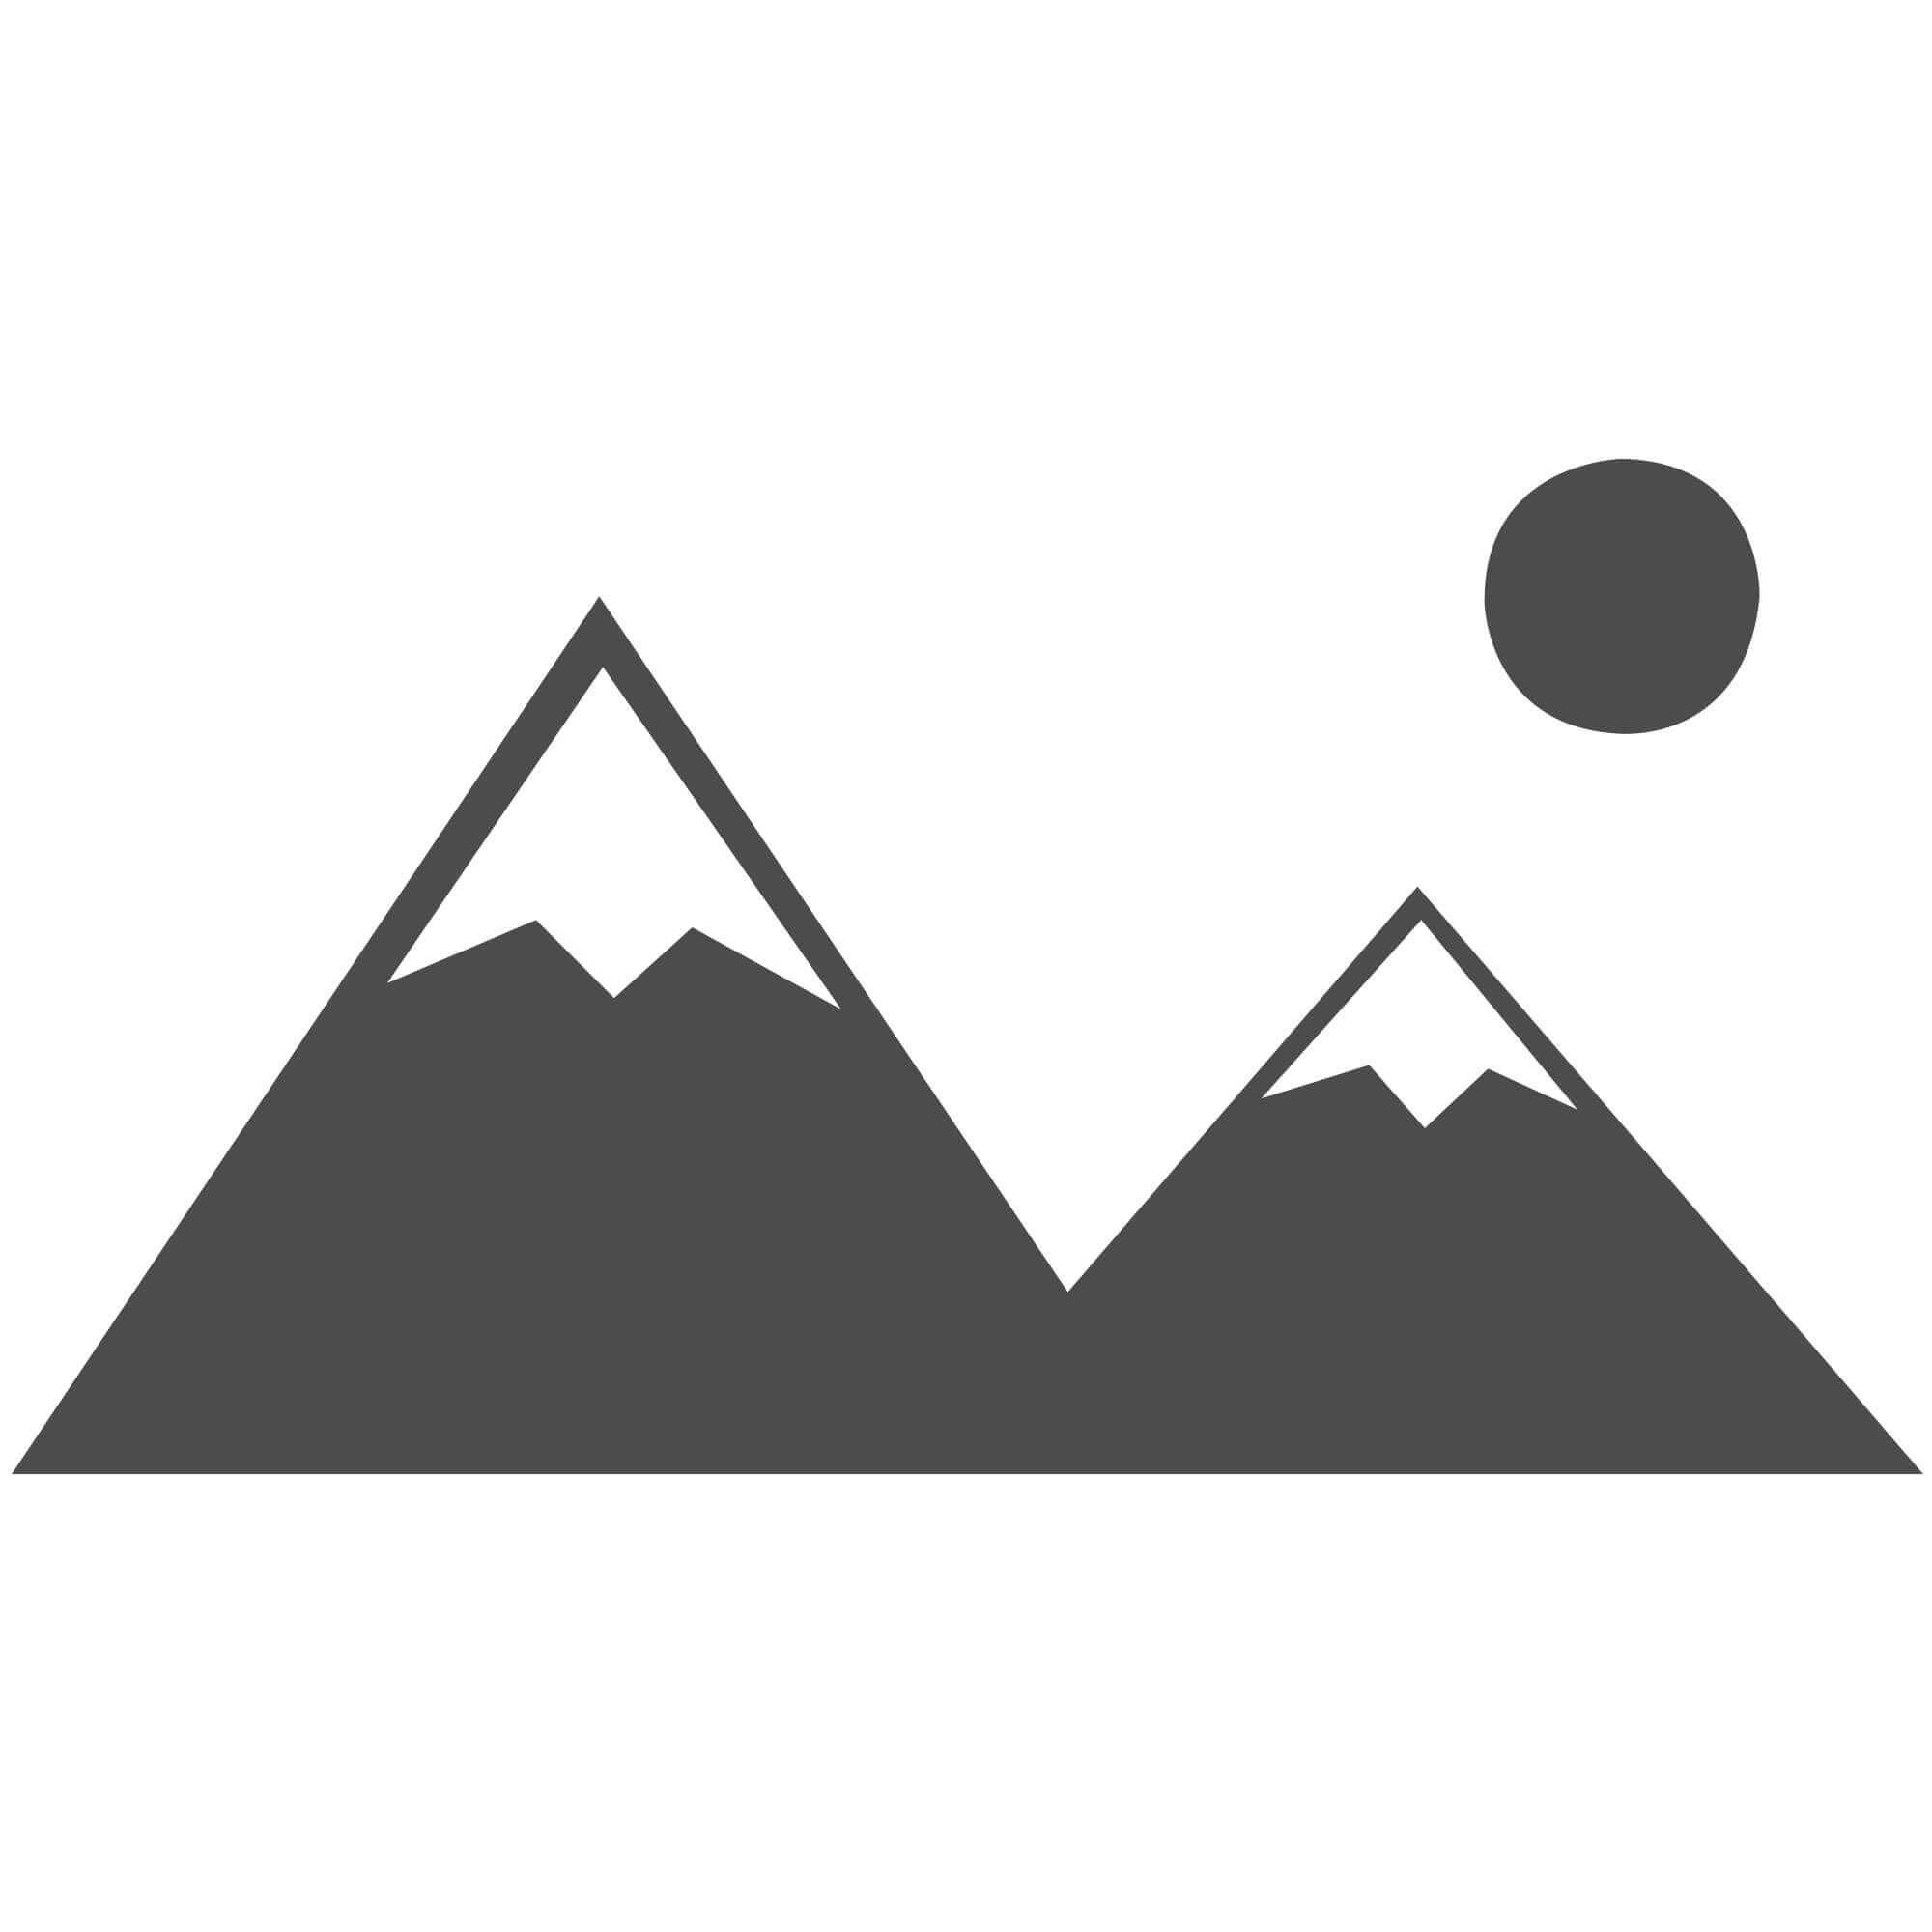 "Verge Furrow Purple Rug - Size 120 x 170 cm (4' x 5'7"")"